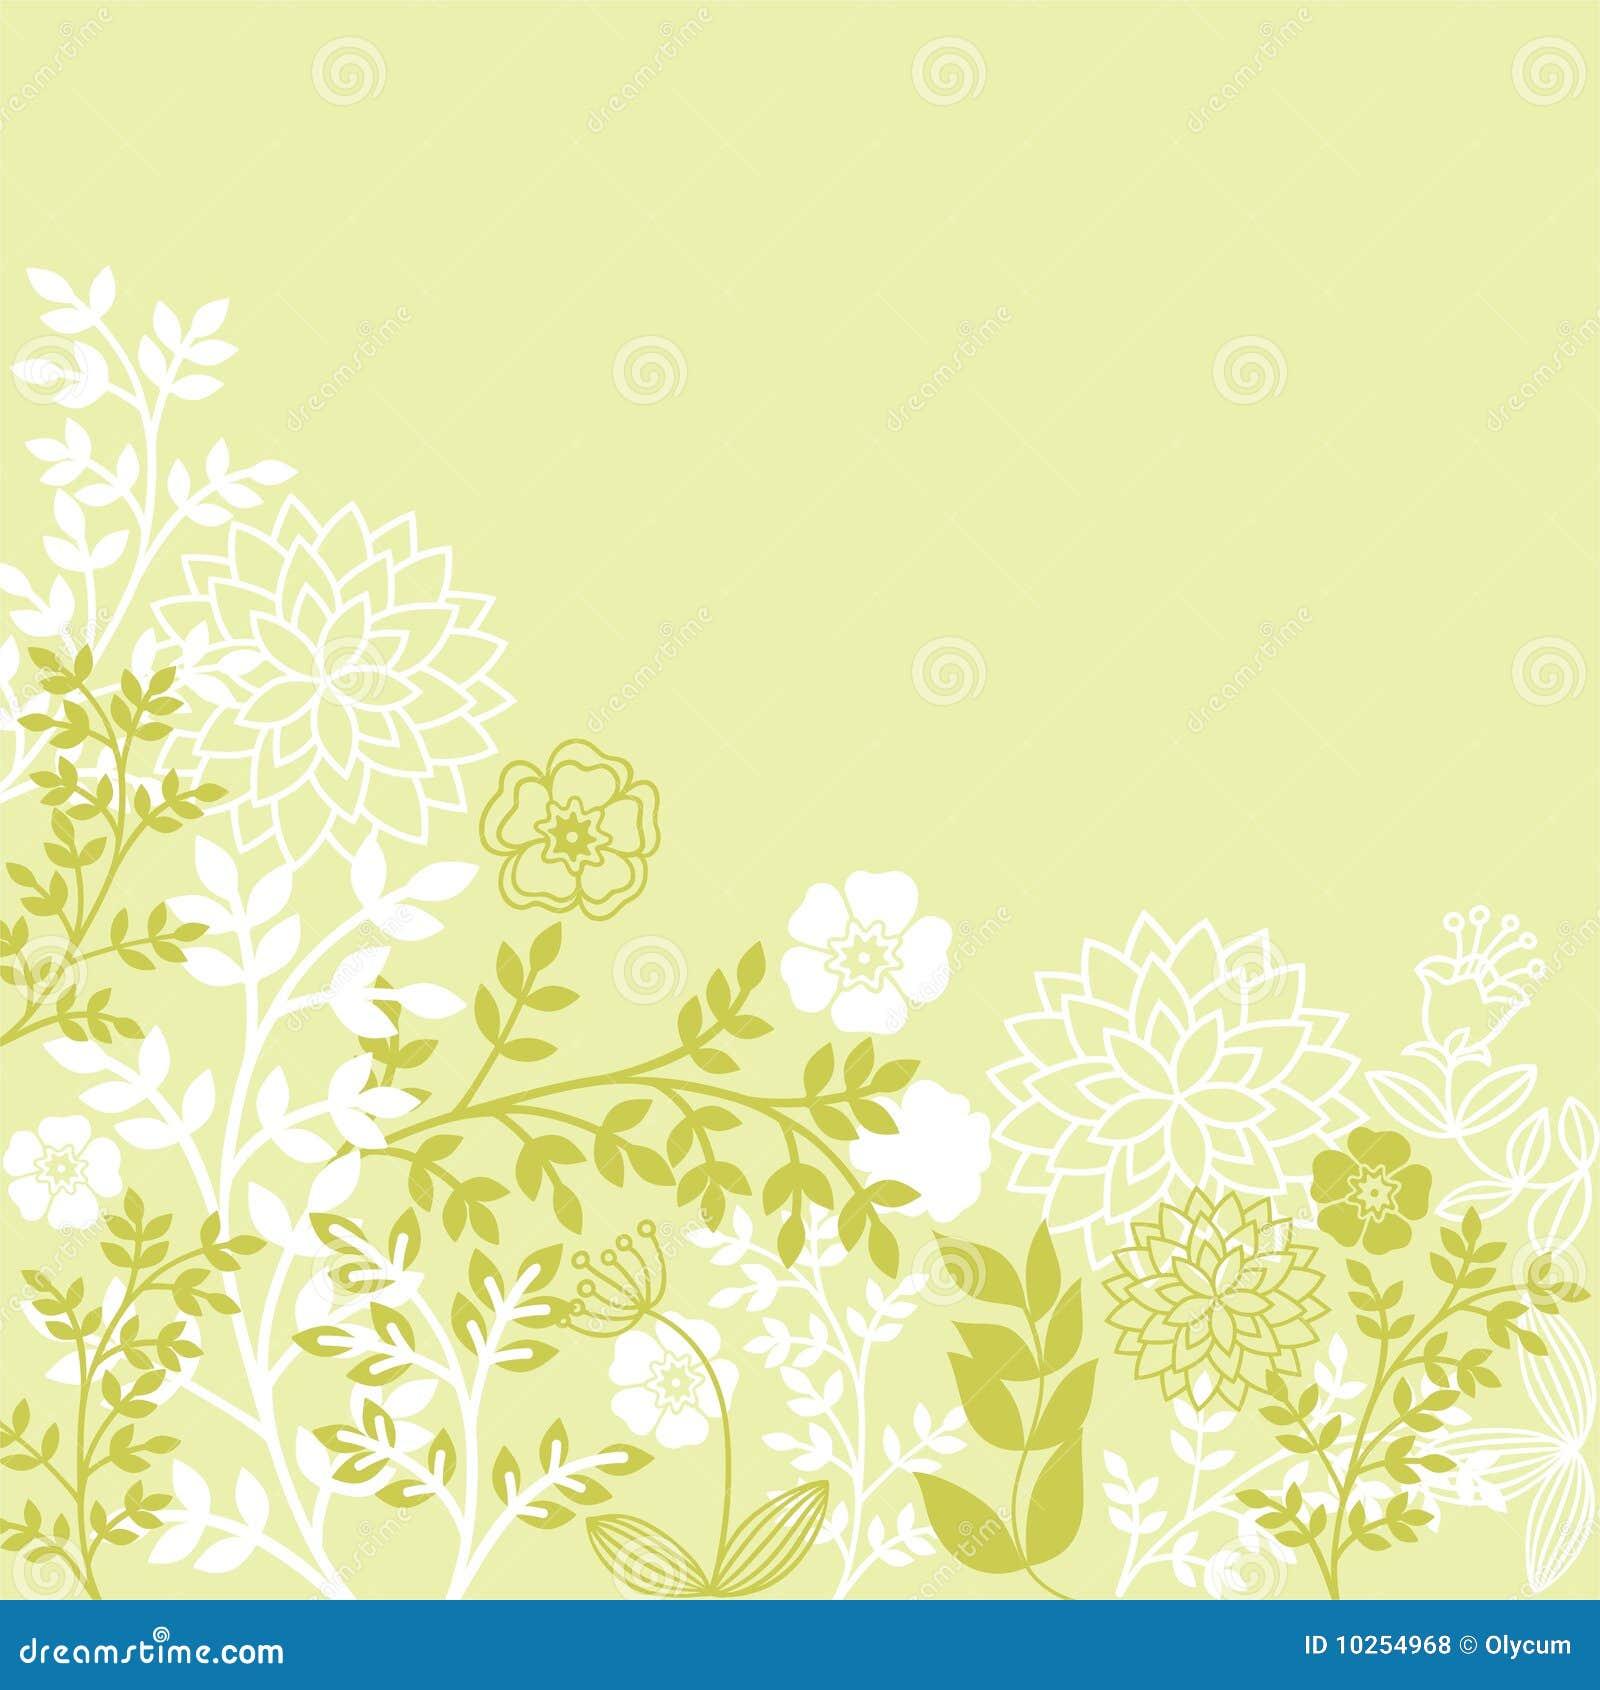 Light Green Floral Patterns Stock Vector